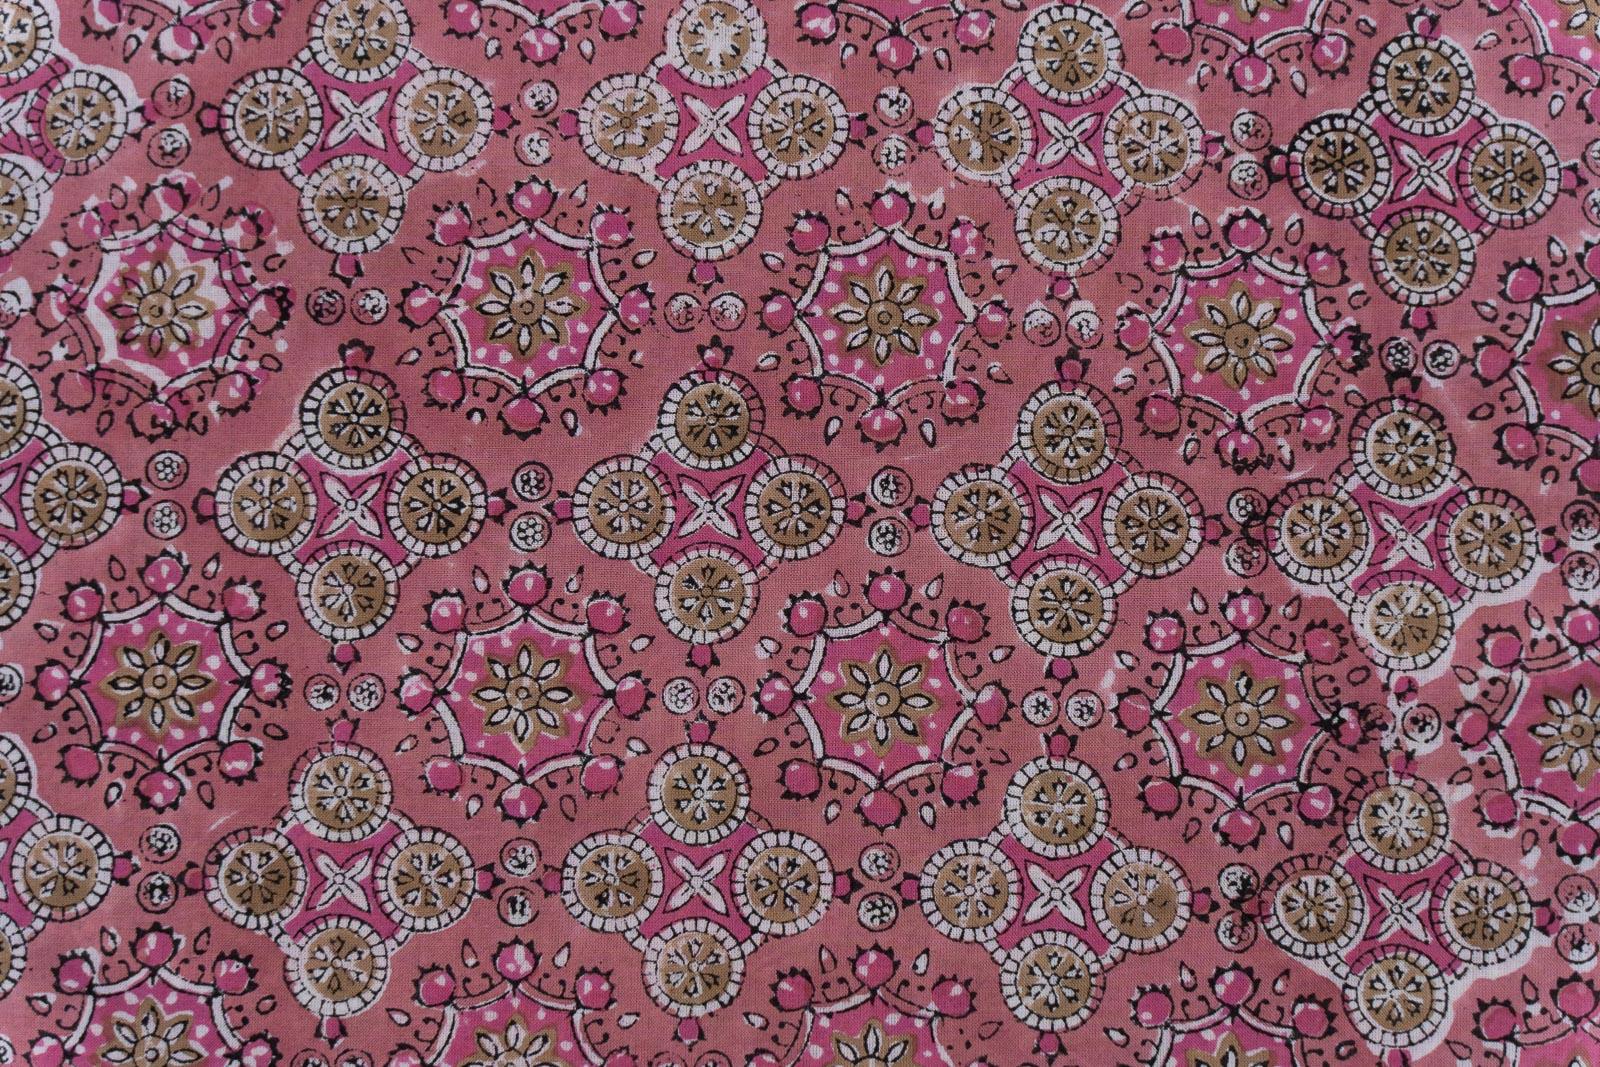 Bubblegum Pink Hand Block Printed Cotton Fabric